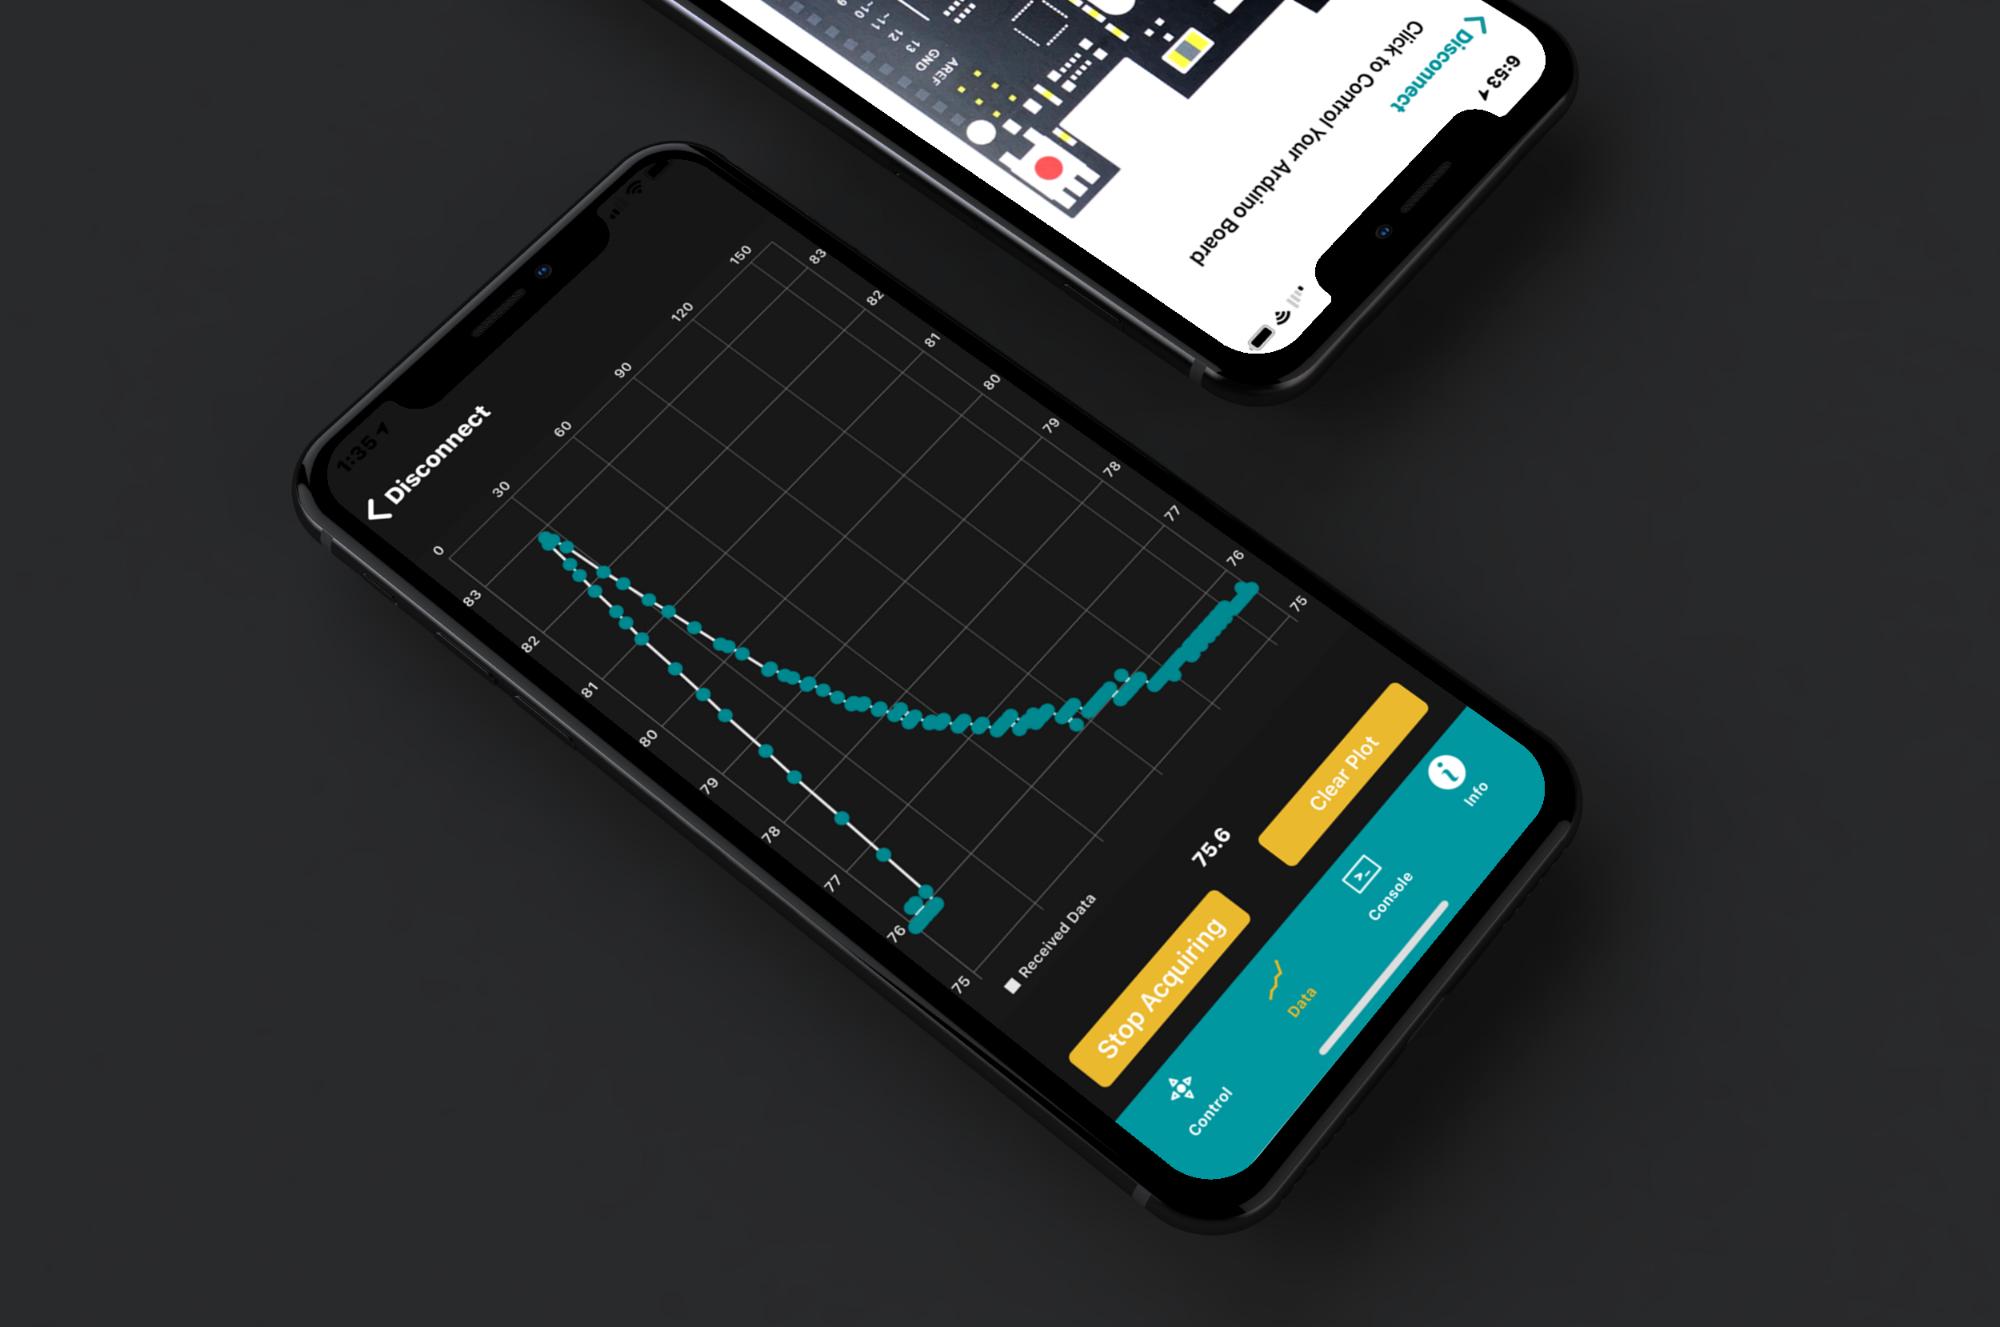 iPhone X Mockup BLExAR App Image Data Analysis.png